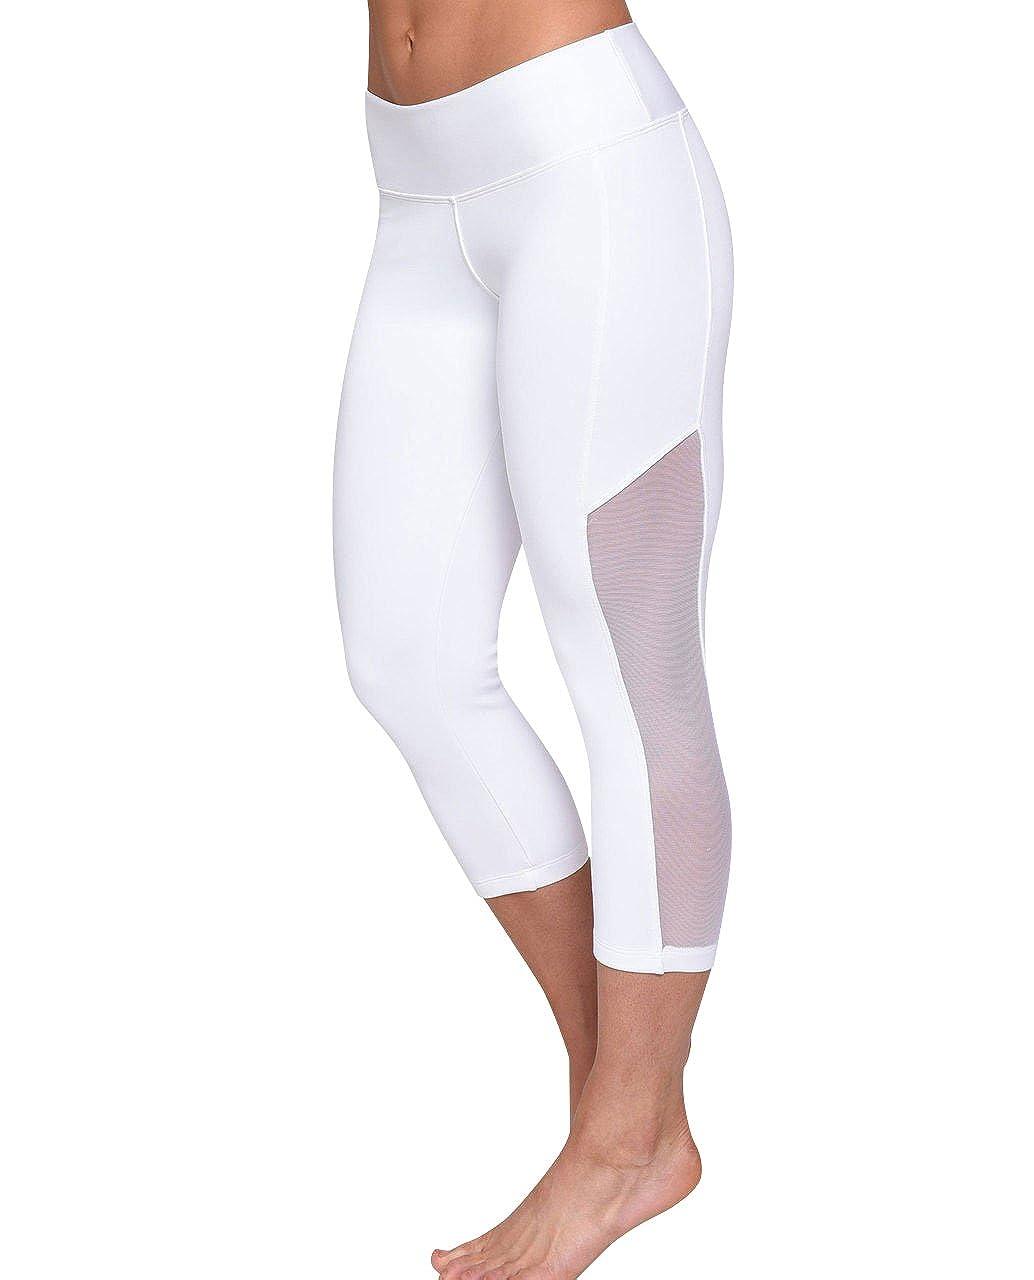 Medium White Leggings Capris Yoga Workout Fitness Tights Womens